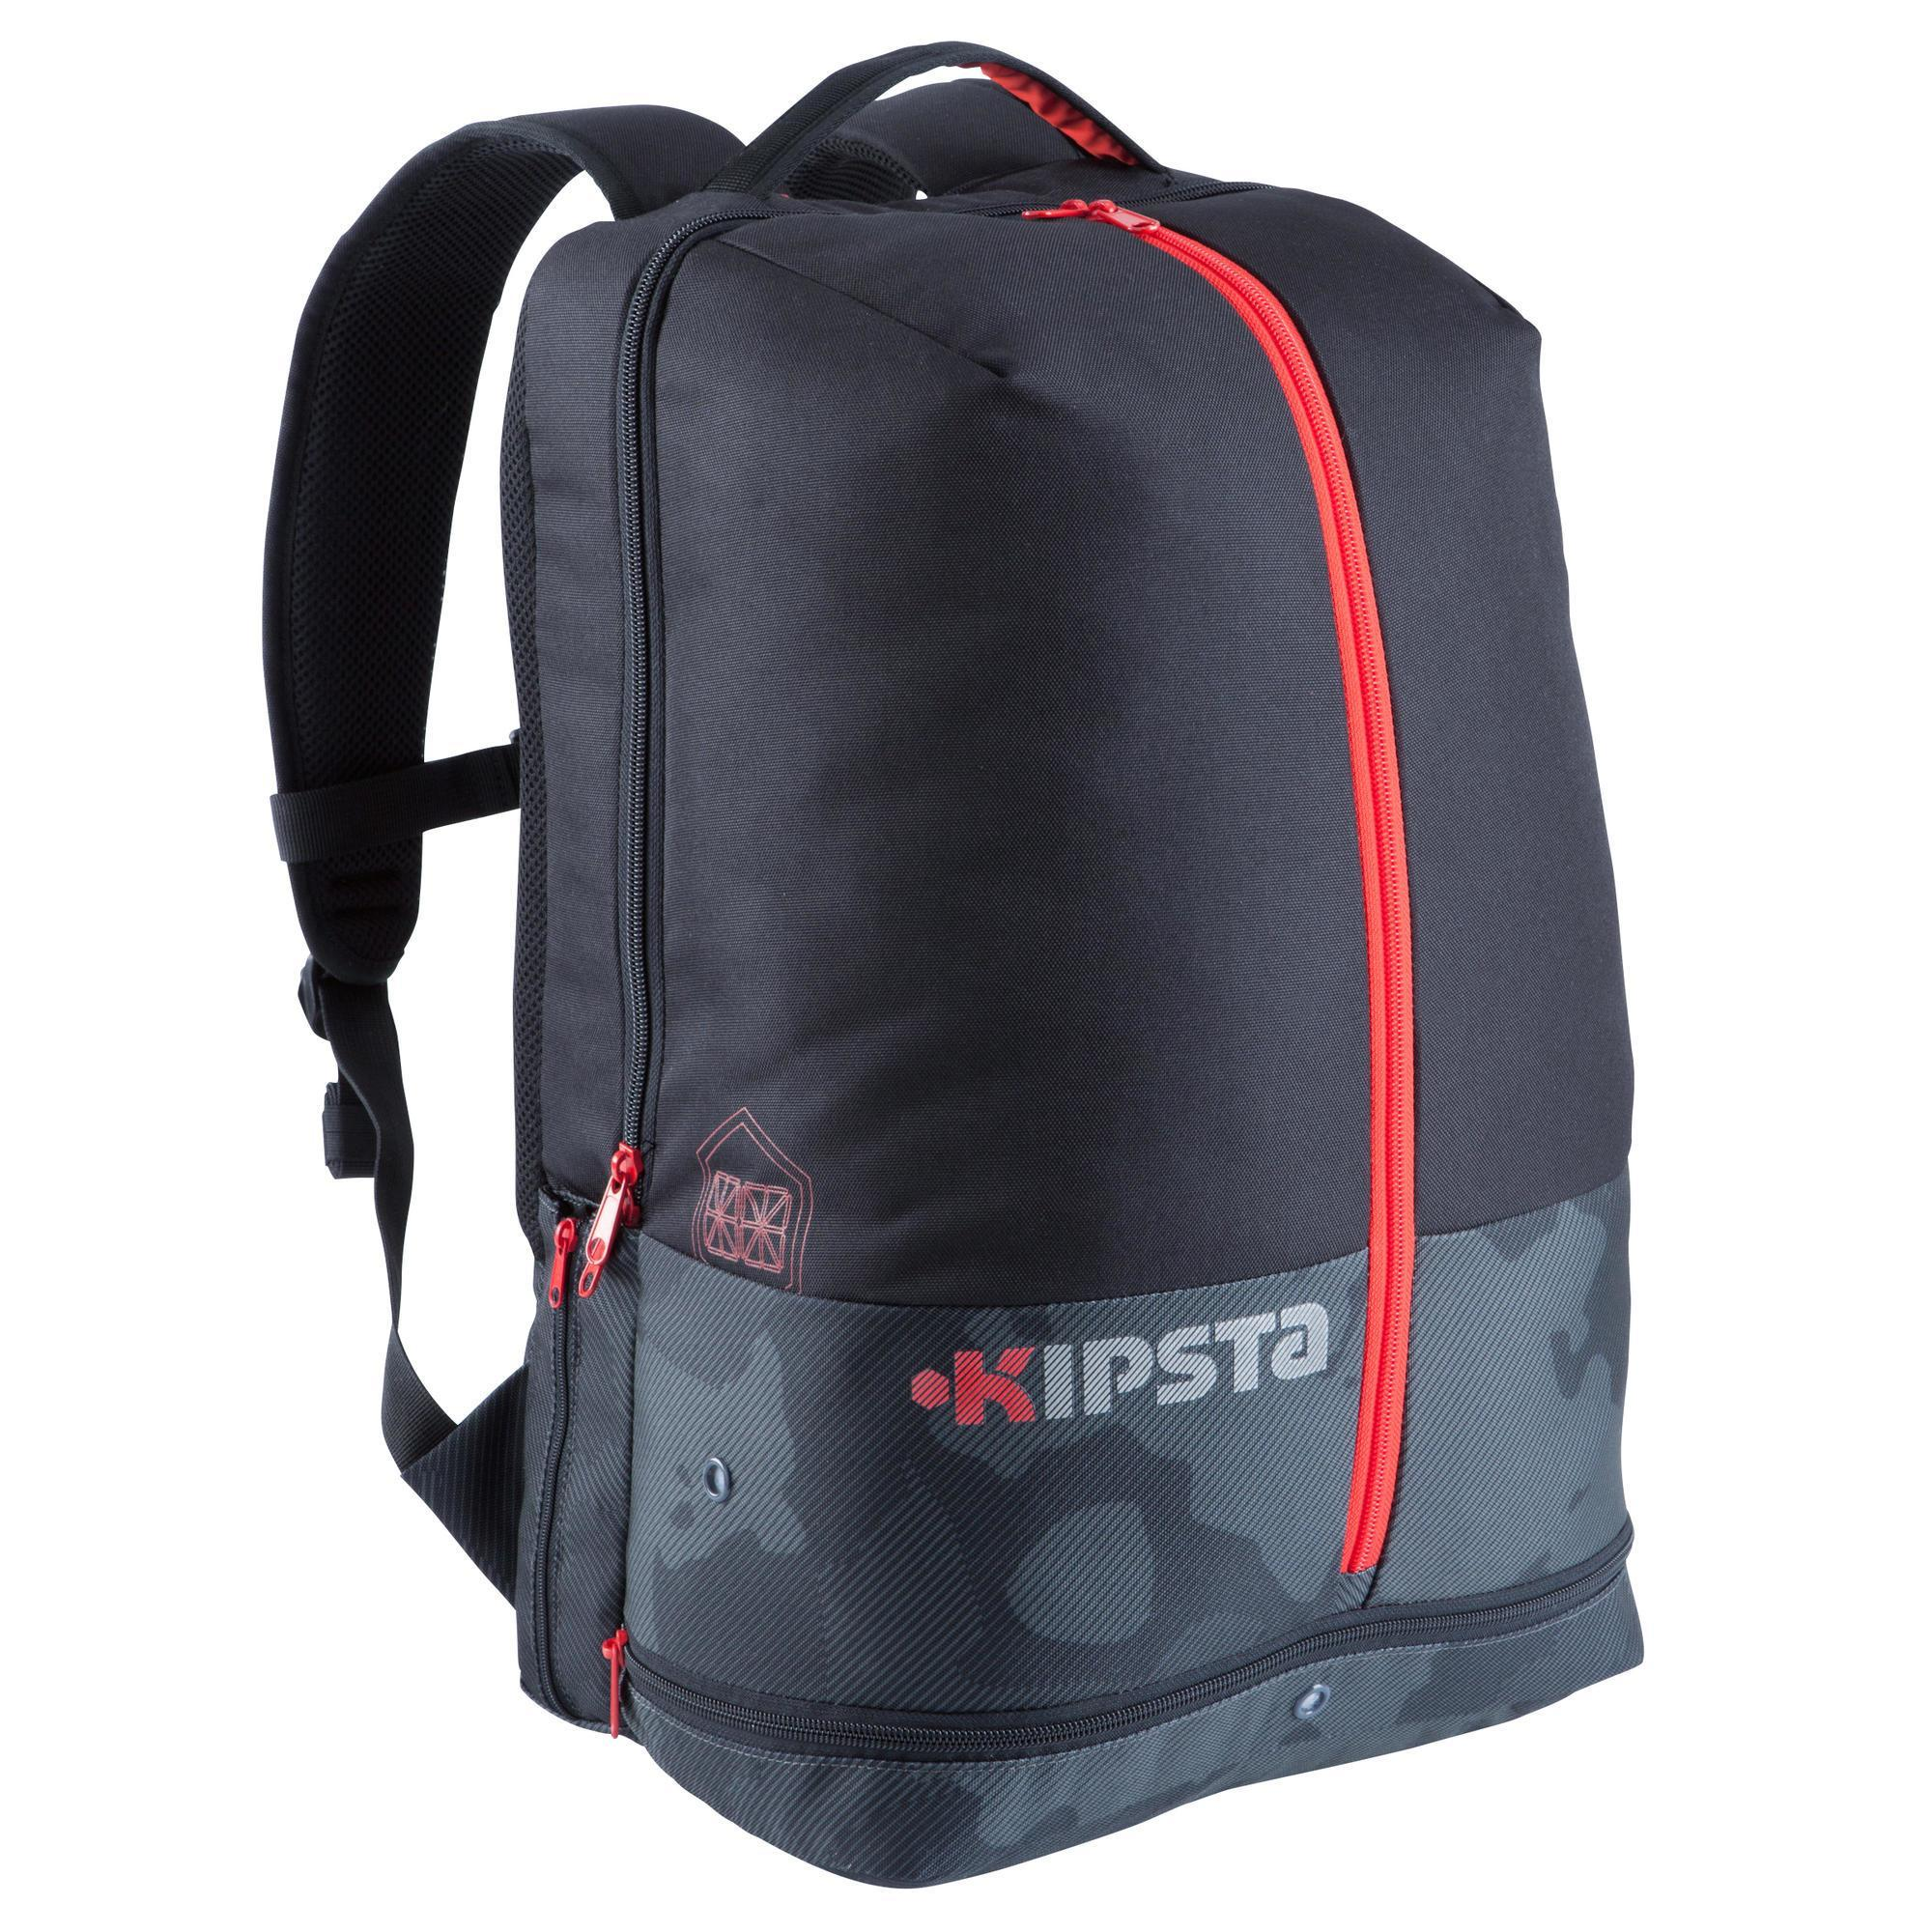 sac dos de sports collectifs intensif 35 litres noir rouge kipsta by decathlon. Black Bedroom Furniture Sets. Home Design Ideas